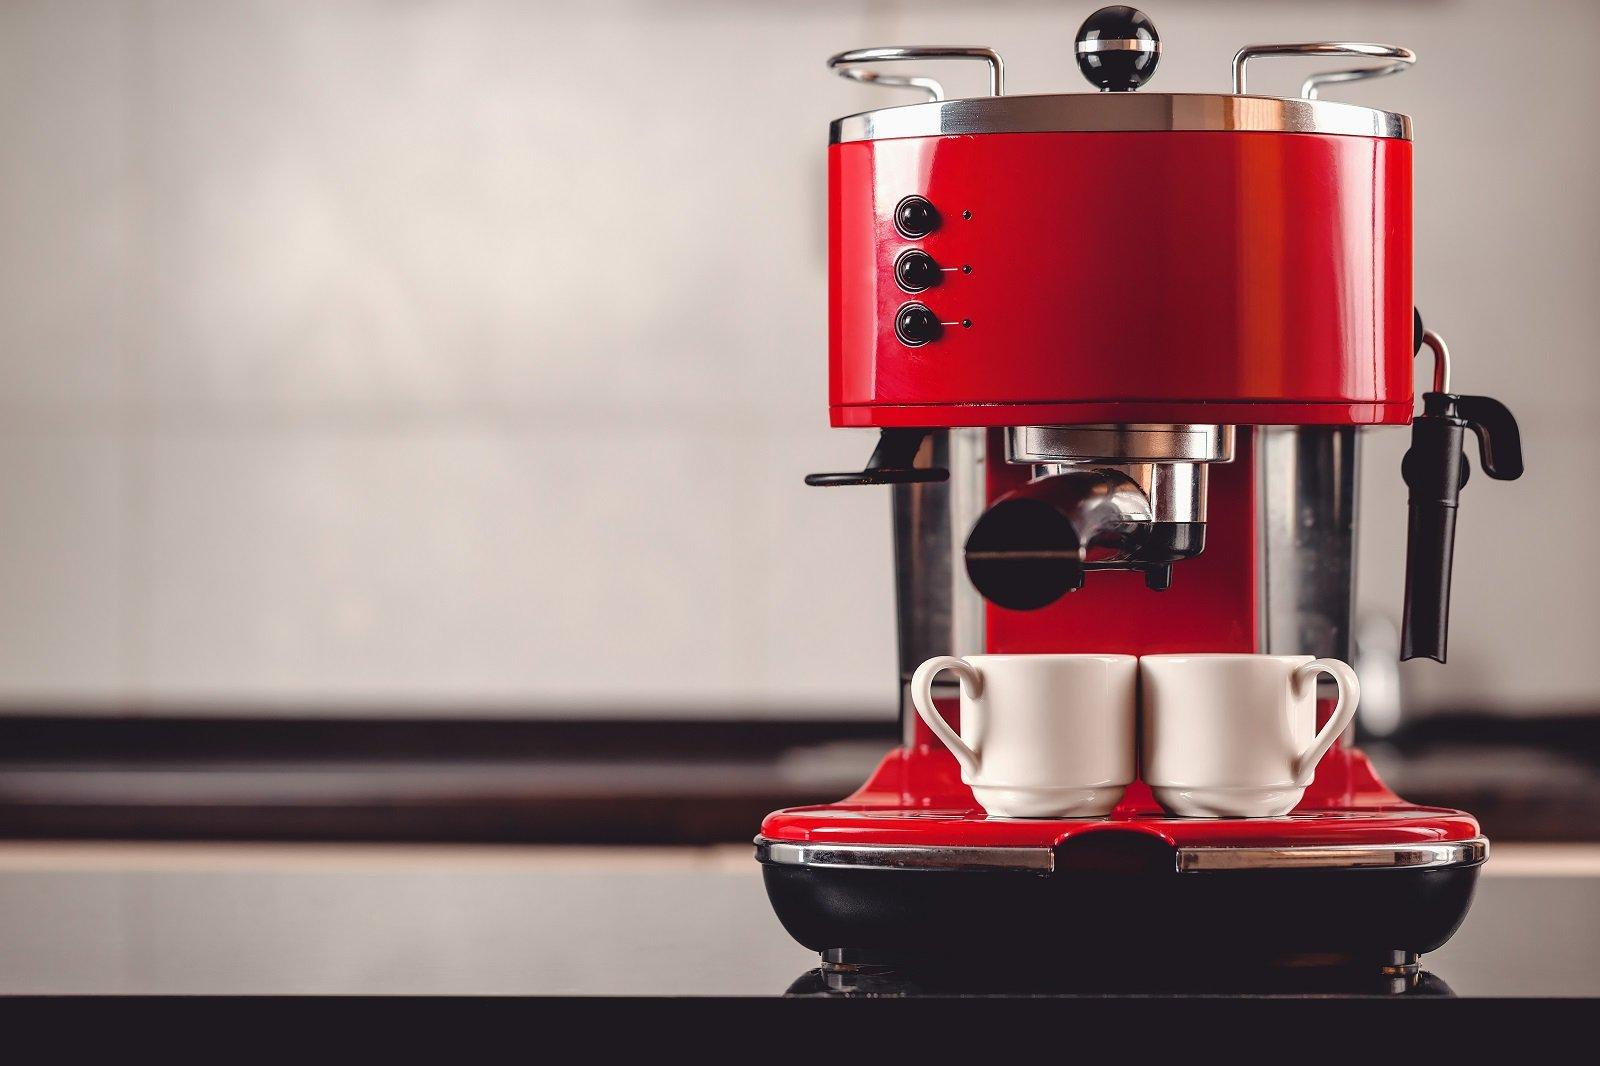 Macchina per il caffè rossa